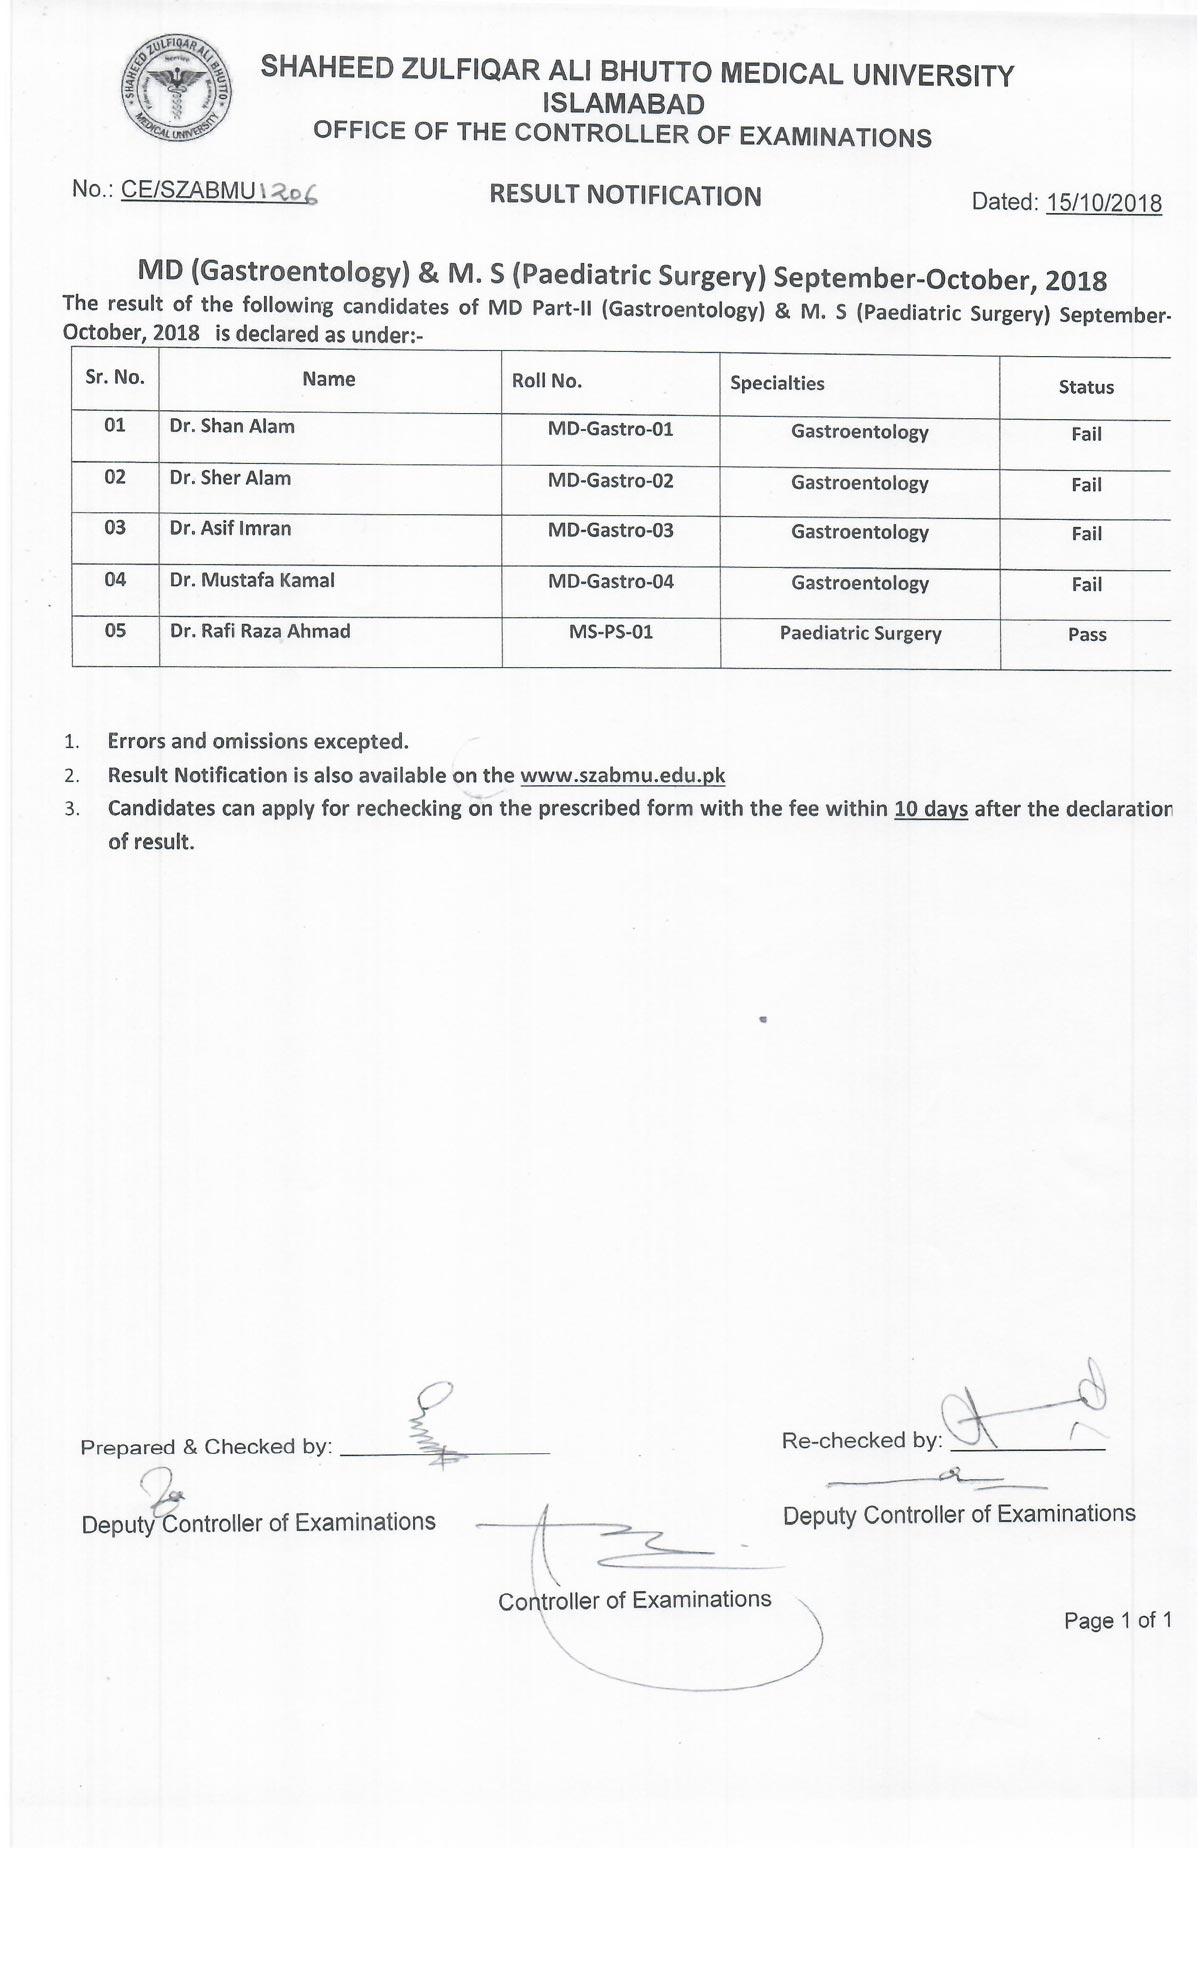 Result Notification - MD (Gastroenterology) & MS(Paediatiric Surgery) September - October 2018